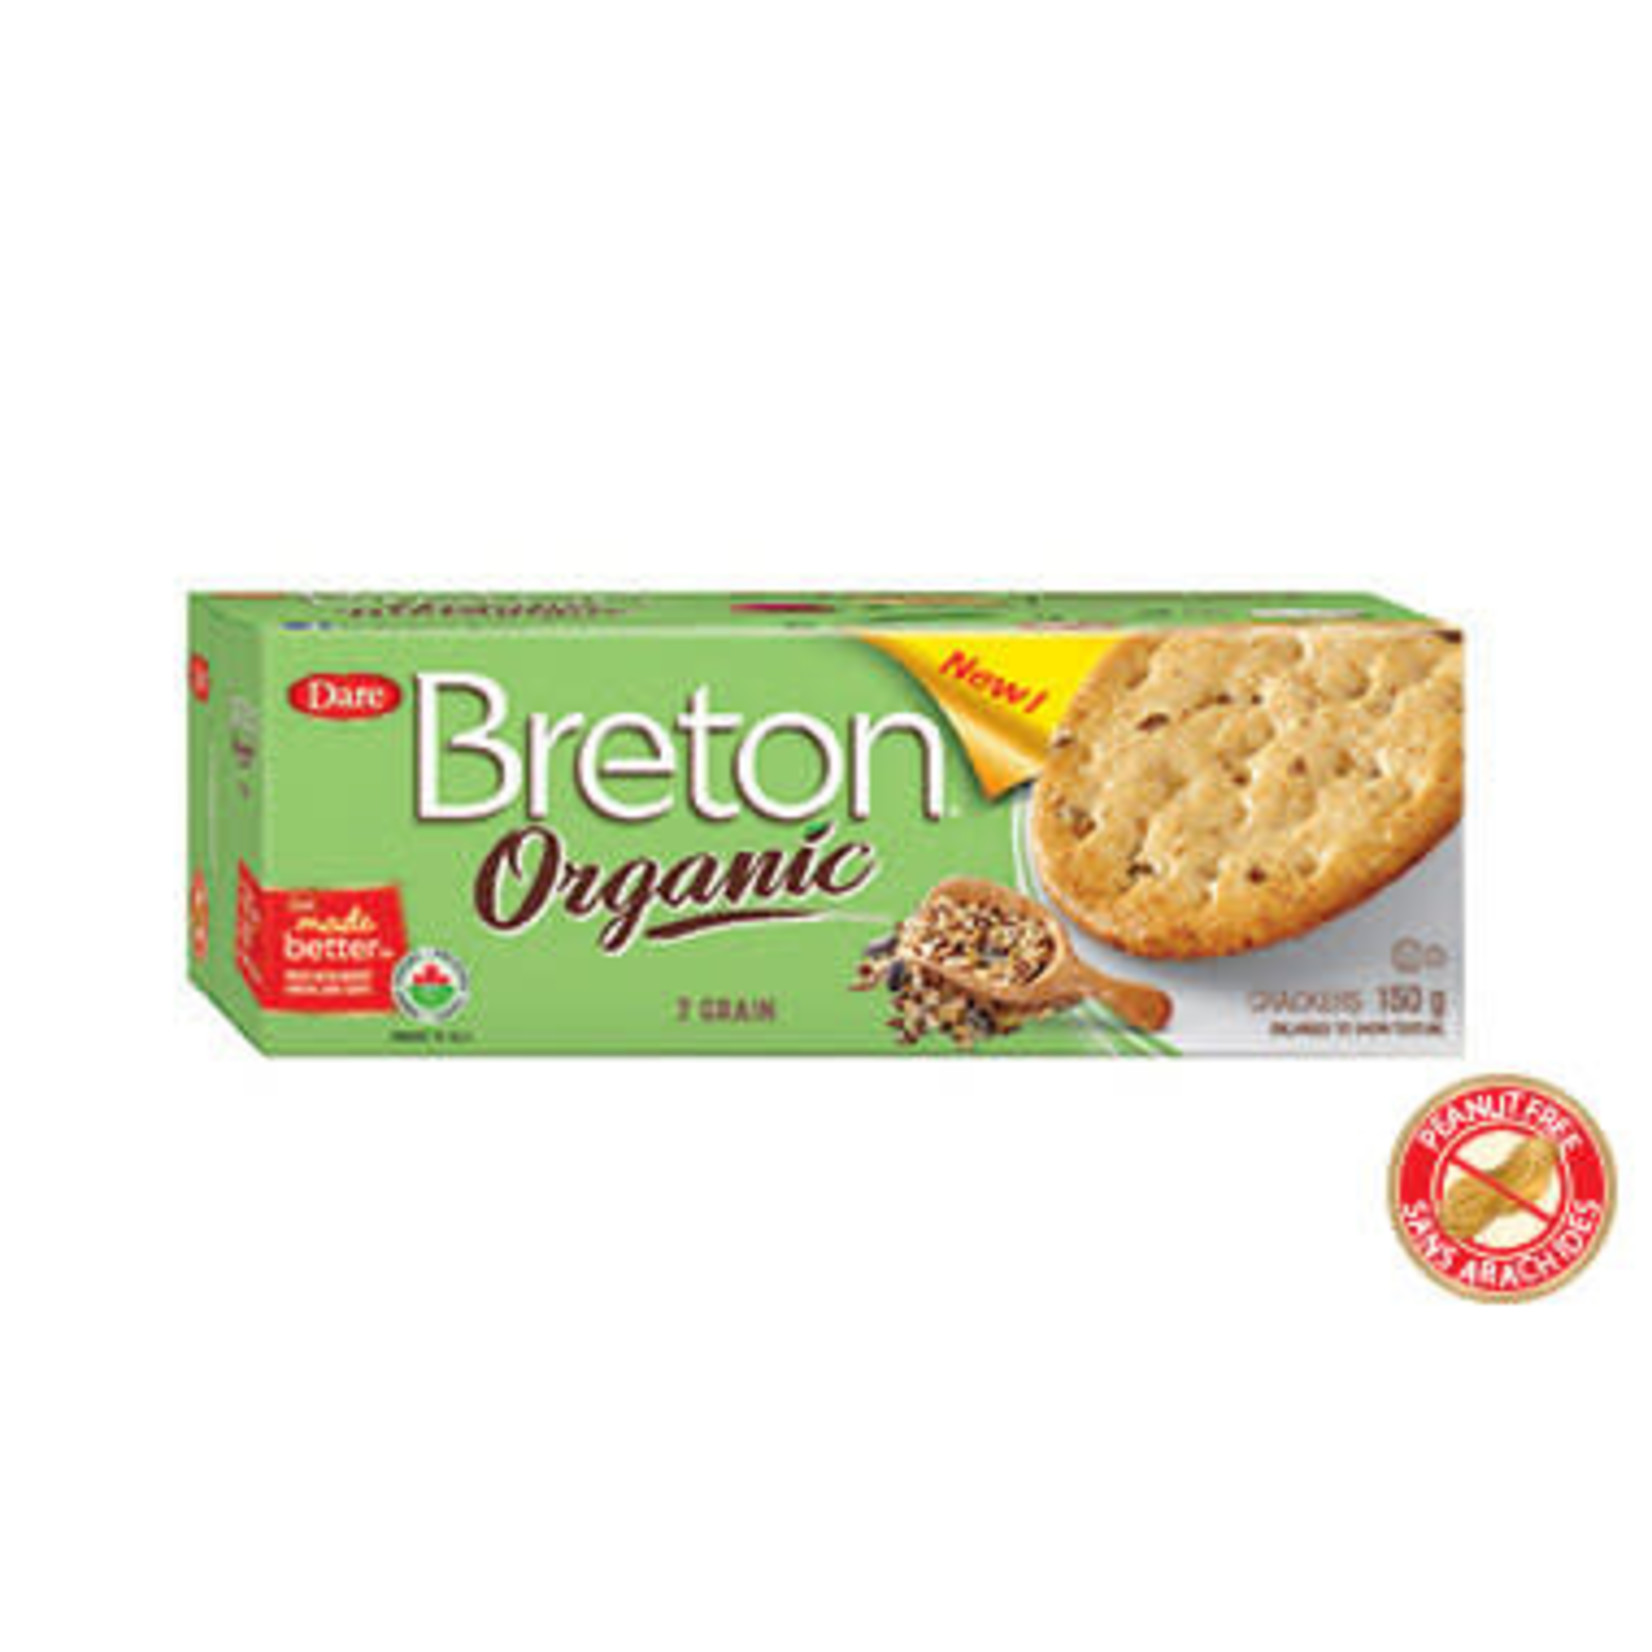 Breton Organic 7 Grain Crackers 150g